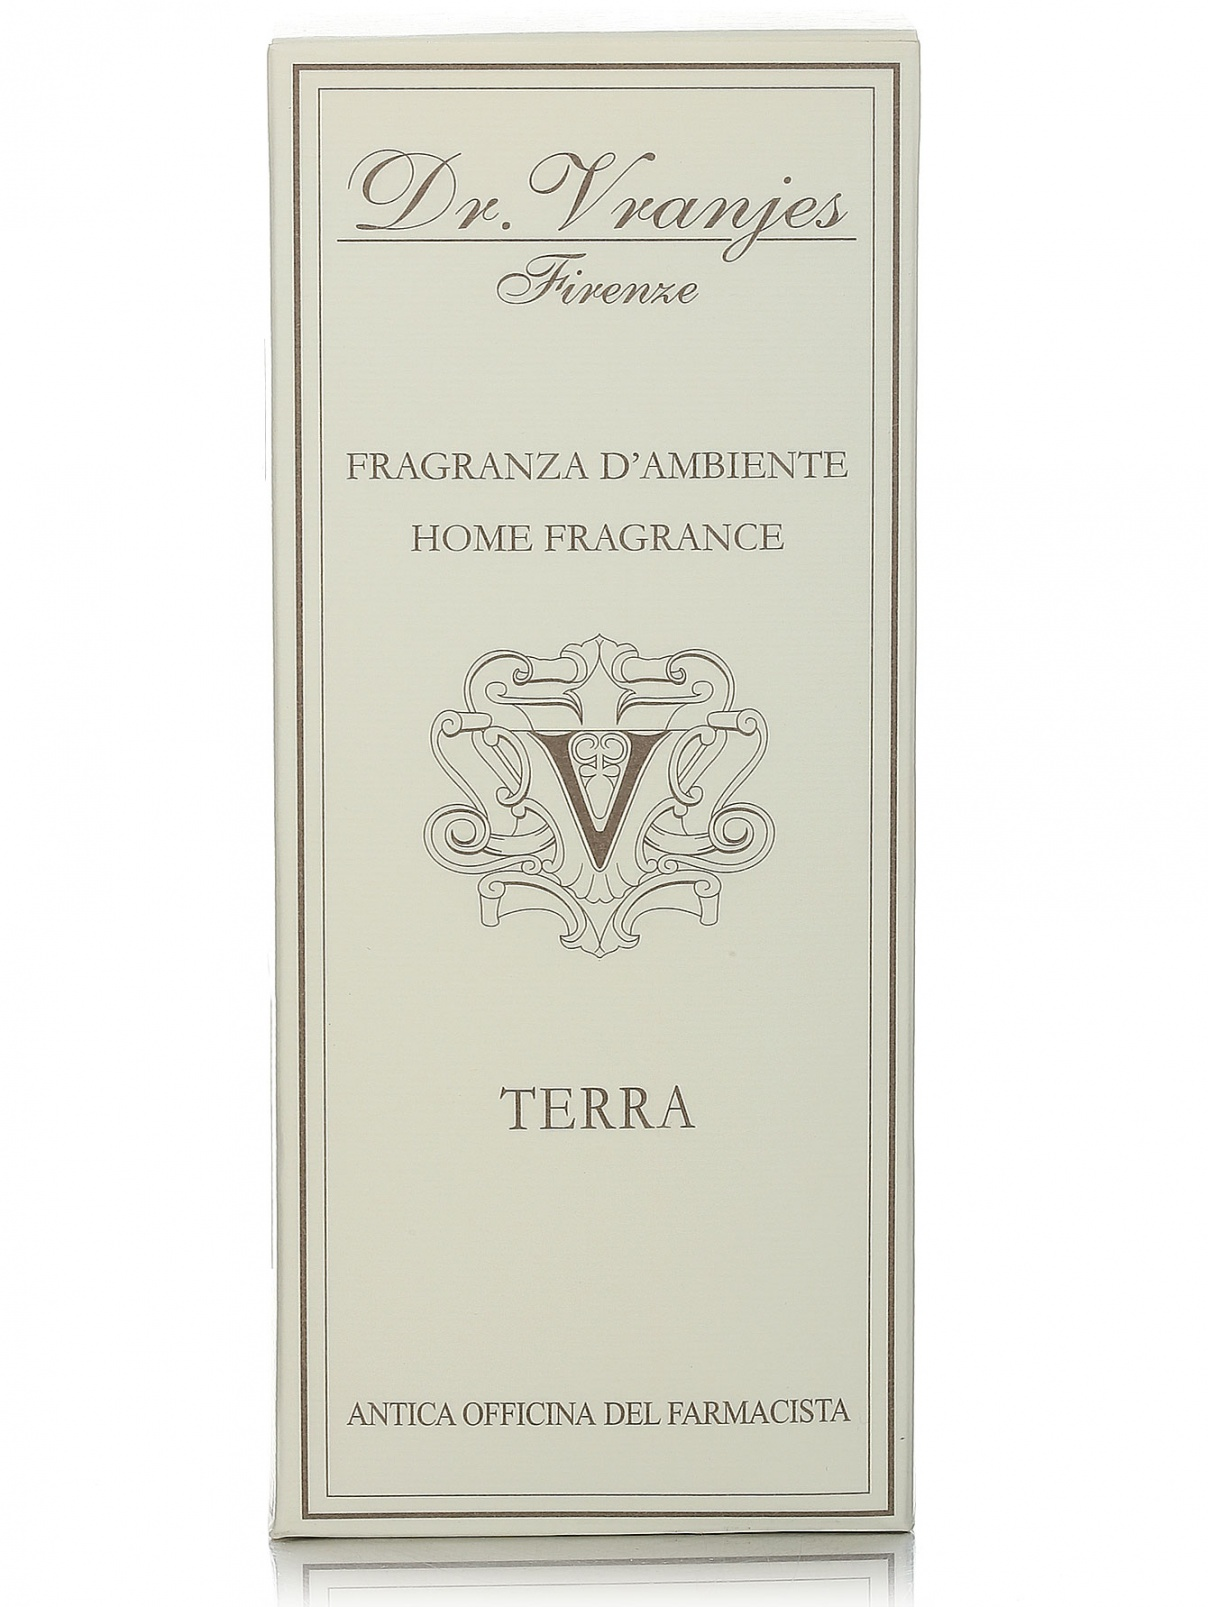 Ароматизатор воздуха Terra - Home Fragrance, 250ml Dr. Vranjes  –  Модель Общий вид